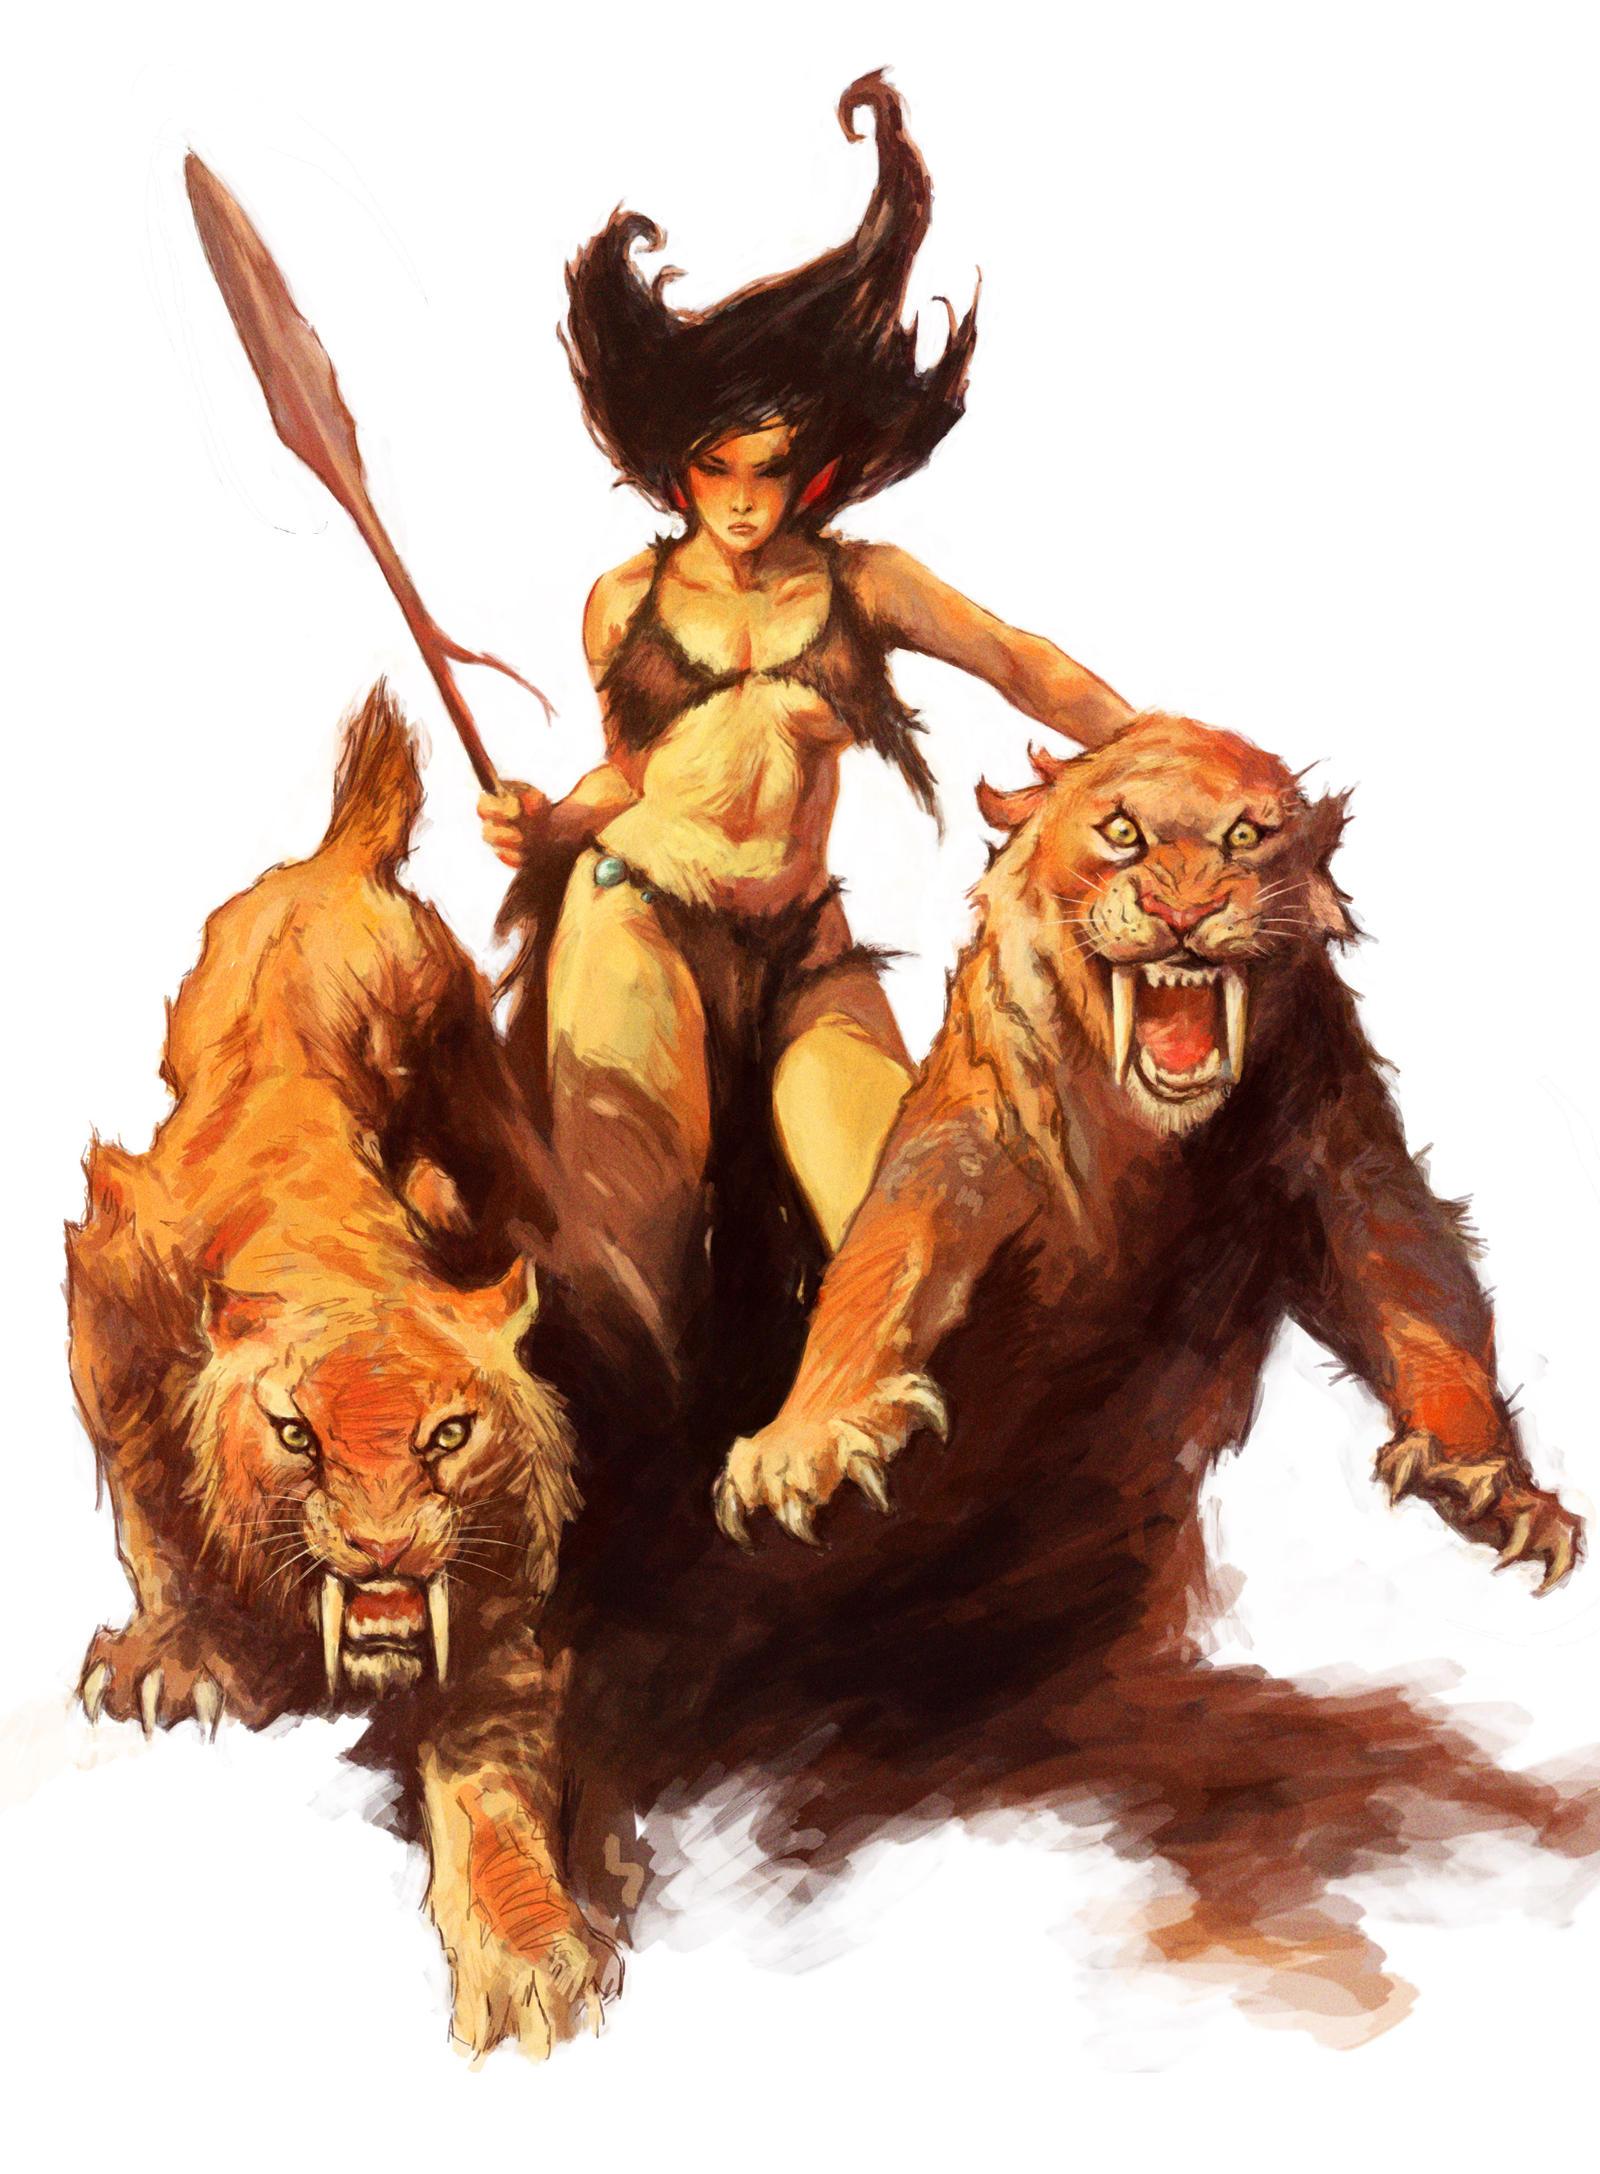 Study   Frank Frazetta #1 - Tiger Girl by Spellsword95 on DeviantArt